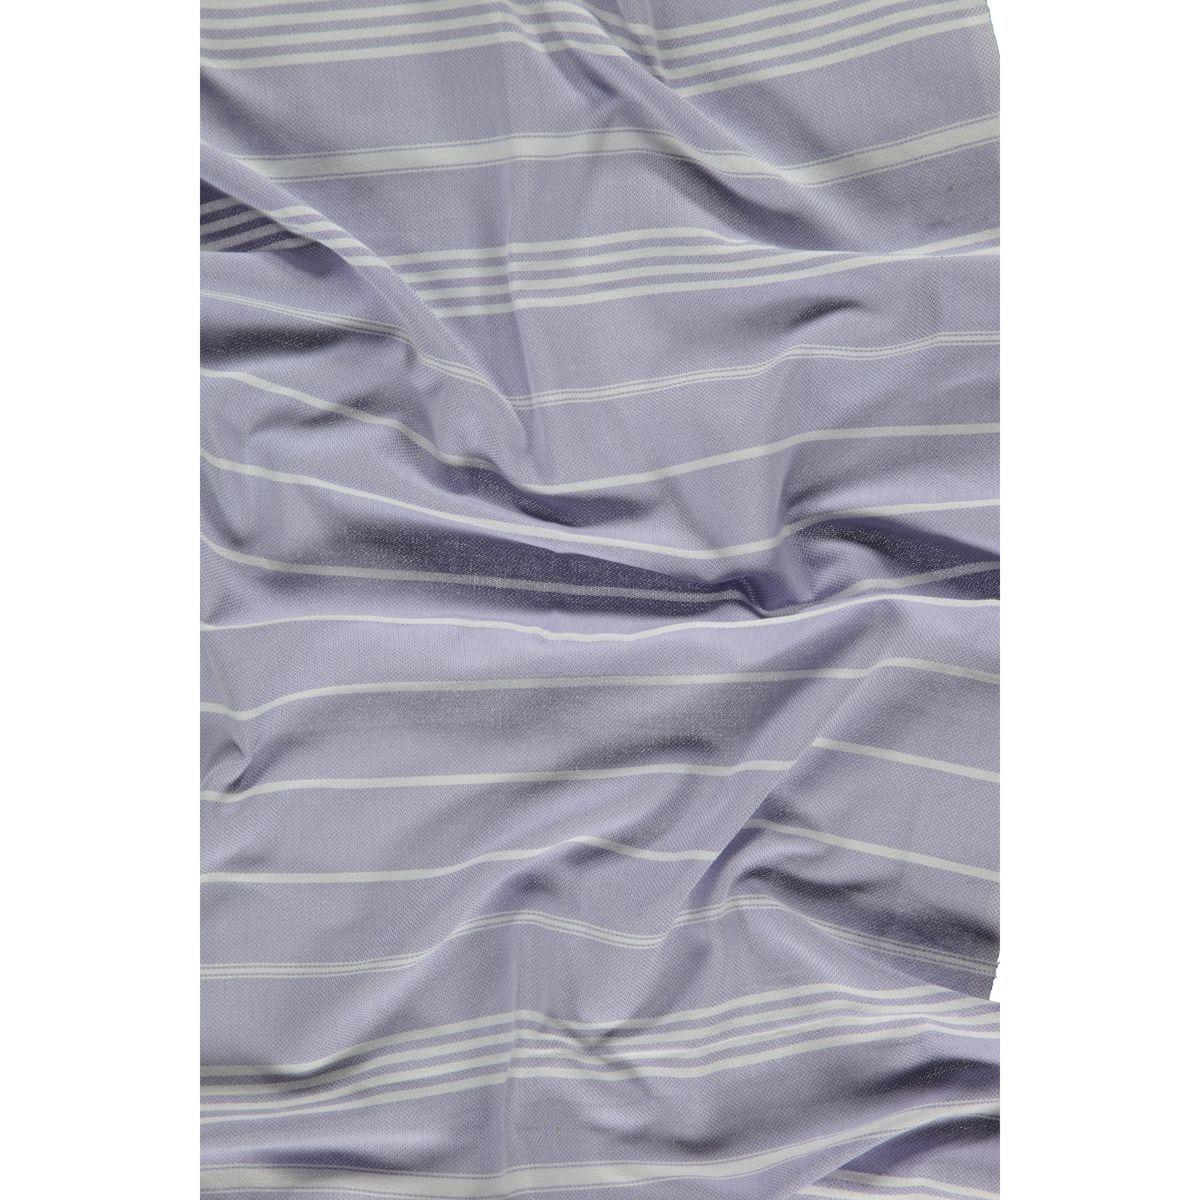 Peshkir Leyla - Lavender